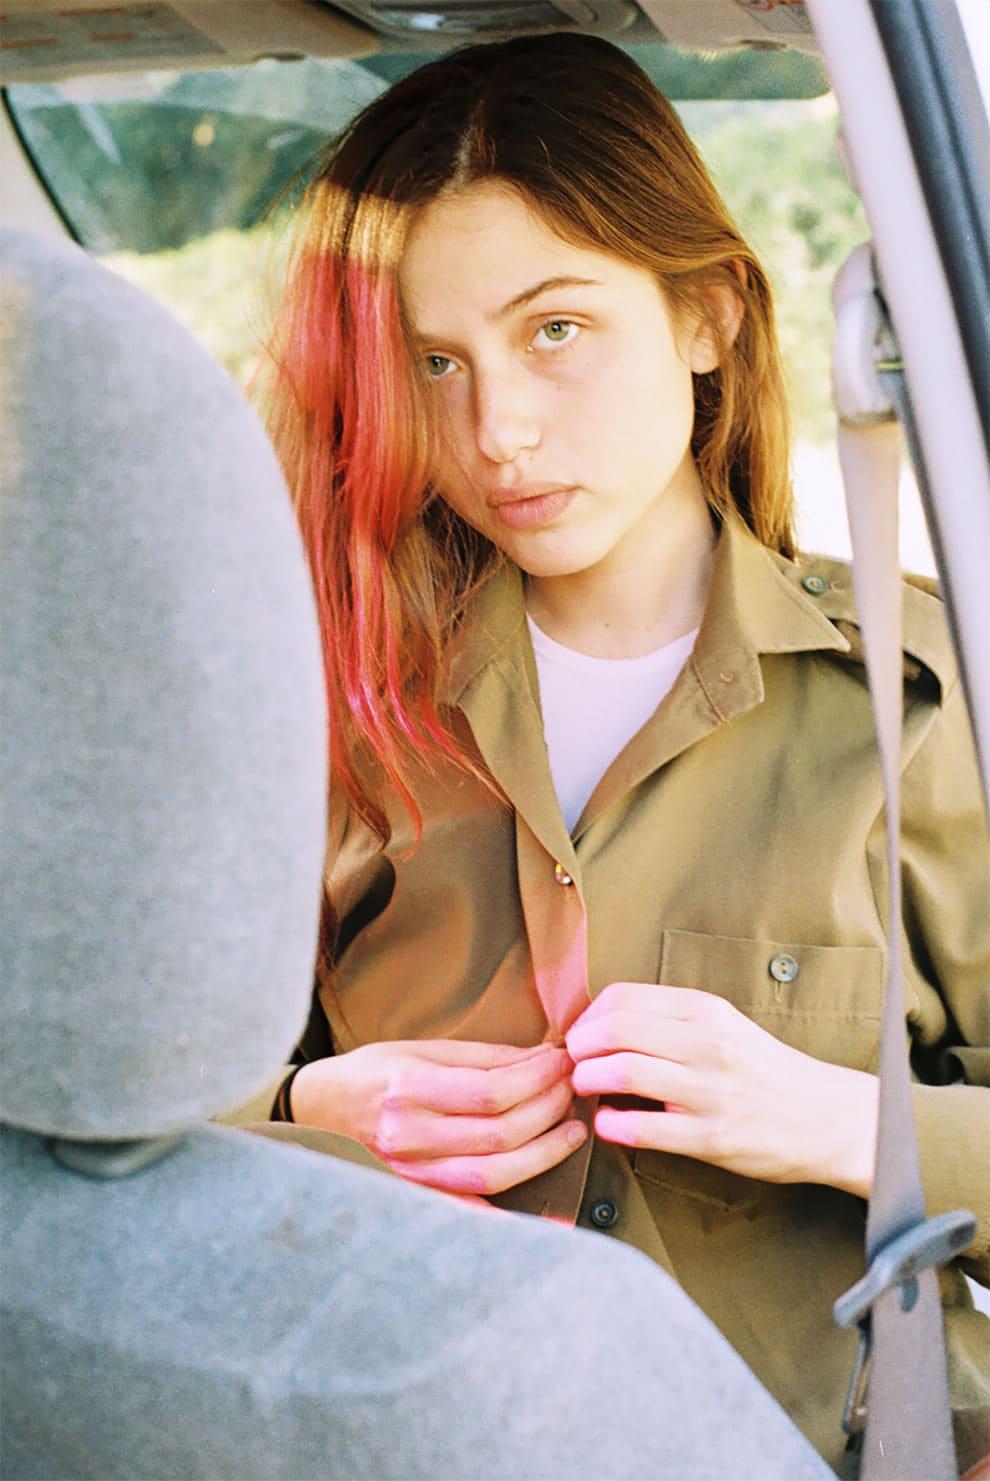 israeli-female-soldiers